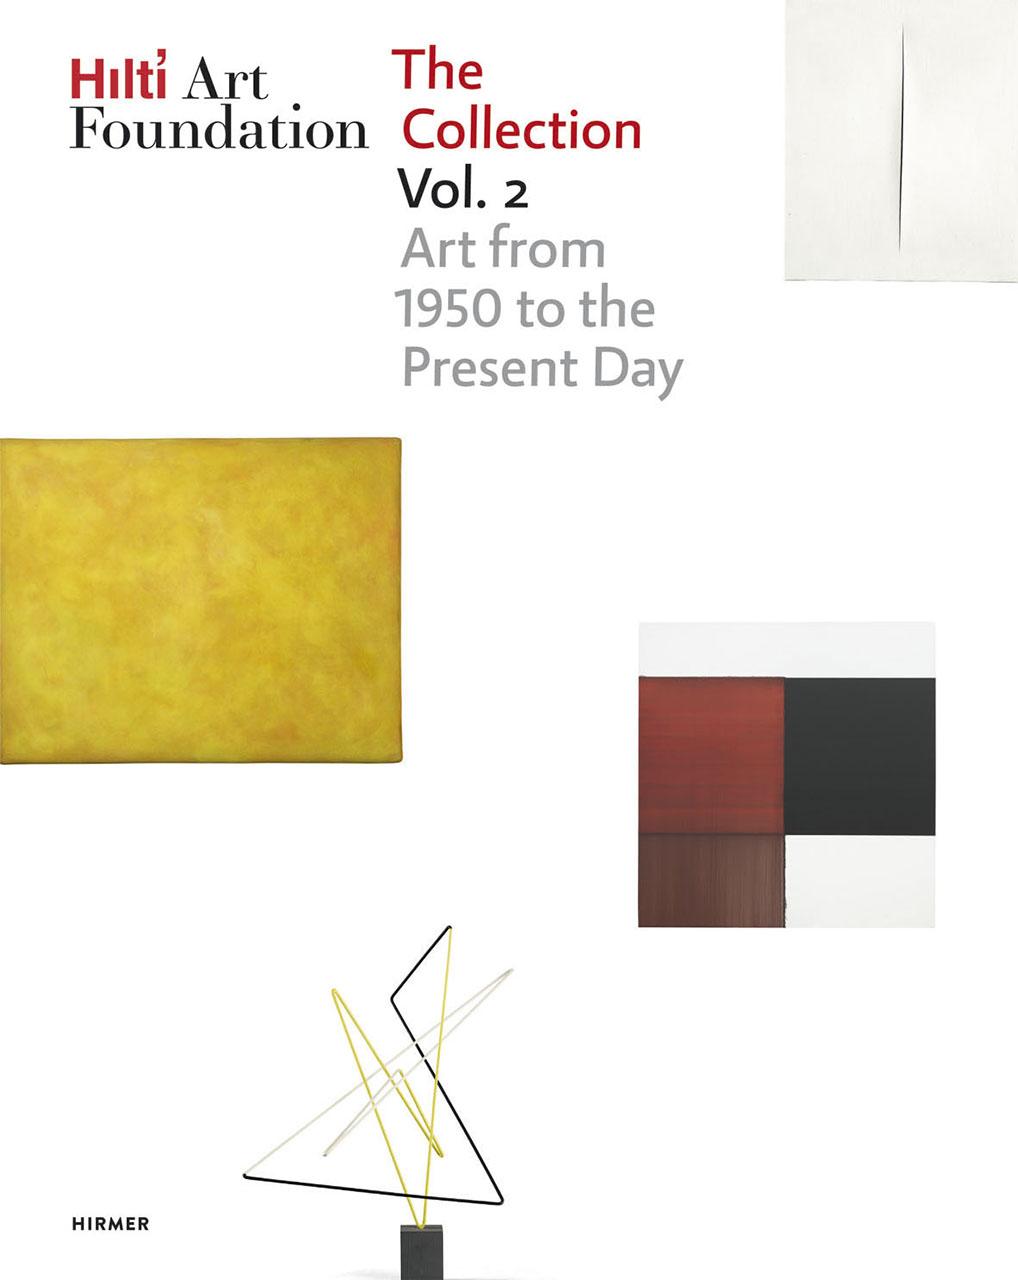 Hilti Art Foundation. The Collection. Vol. II